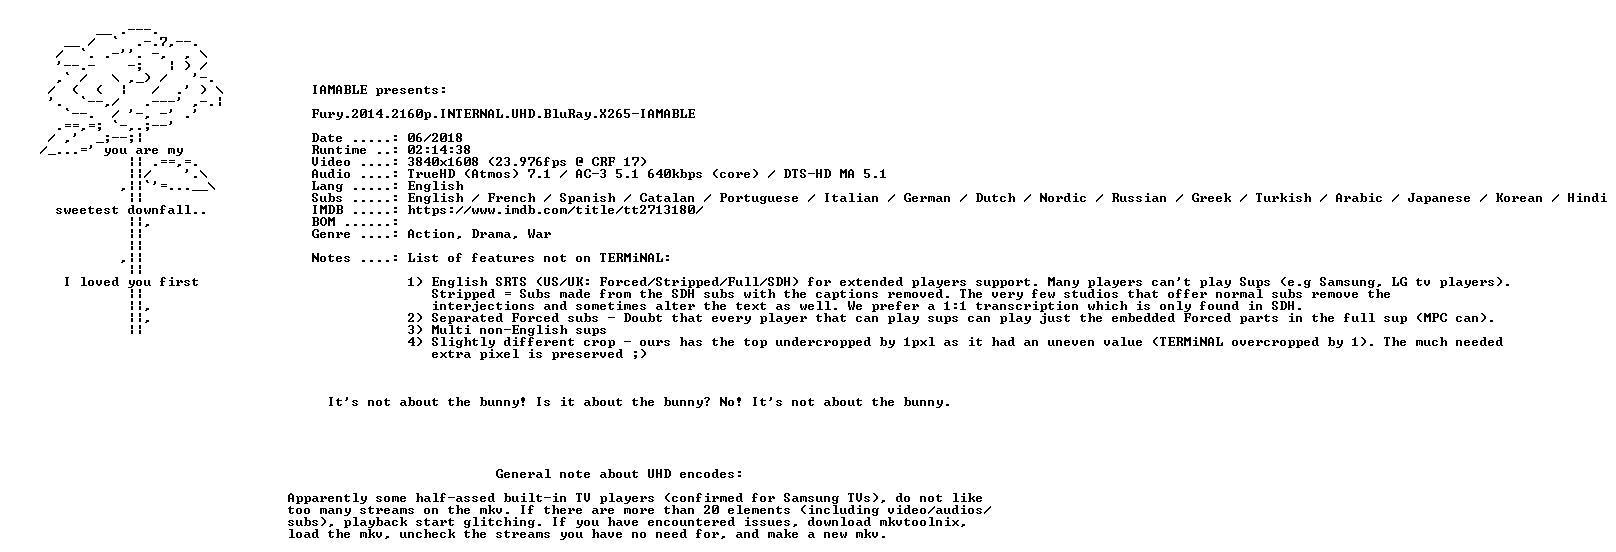 Fury 2014 2160p INTERNAL UHD BluRay X265-IAMABLE